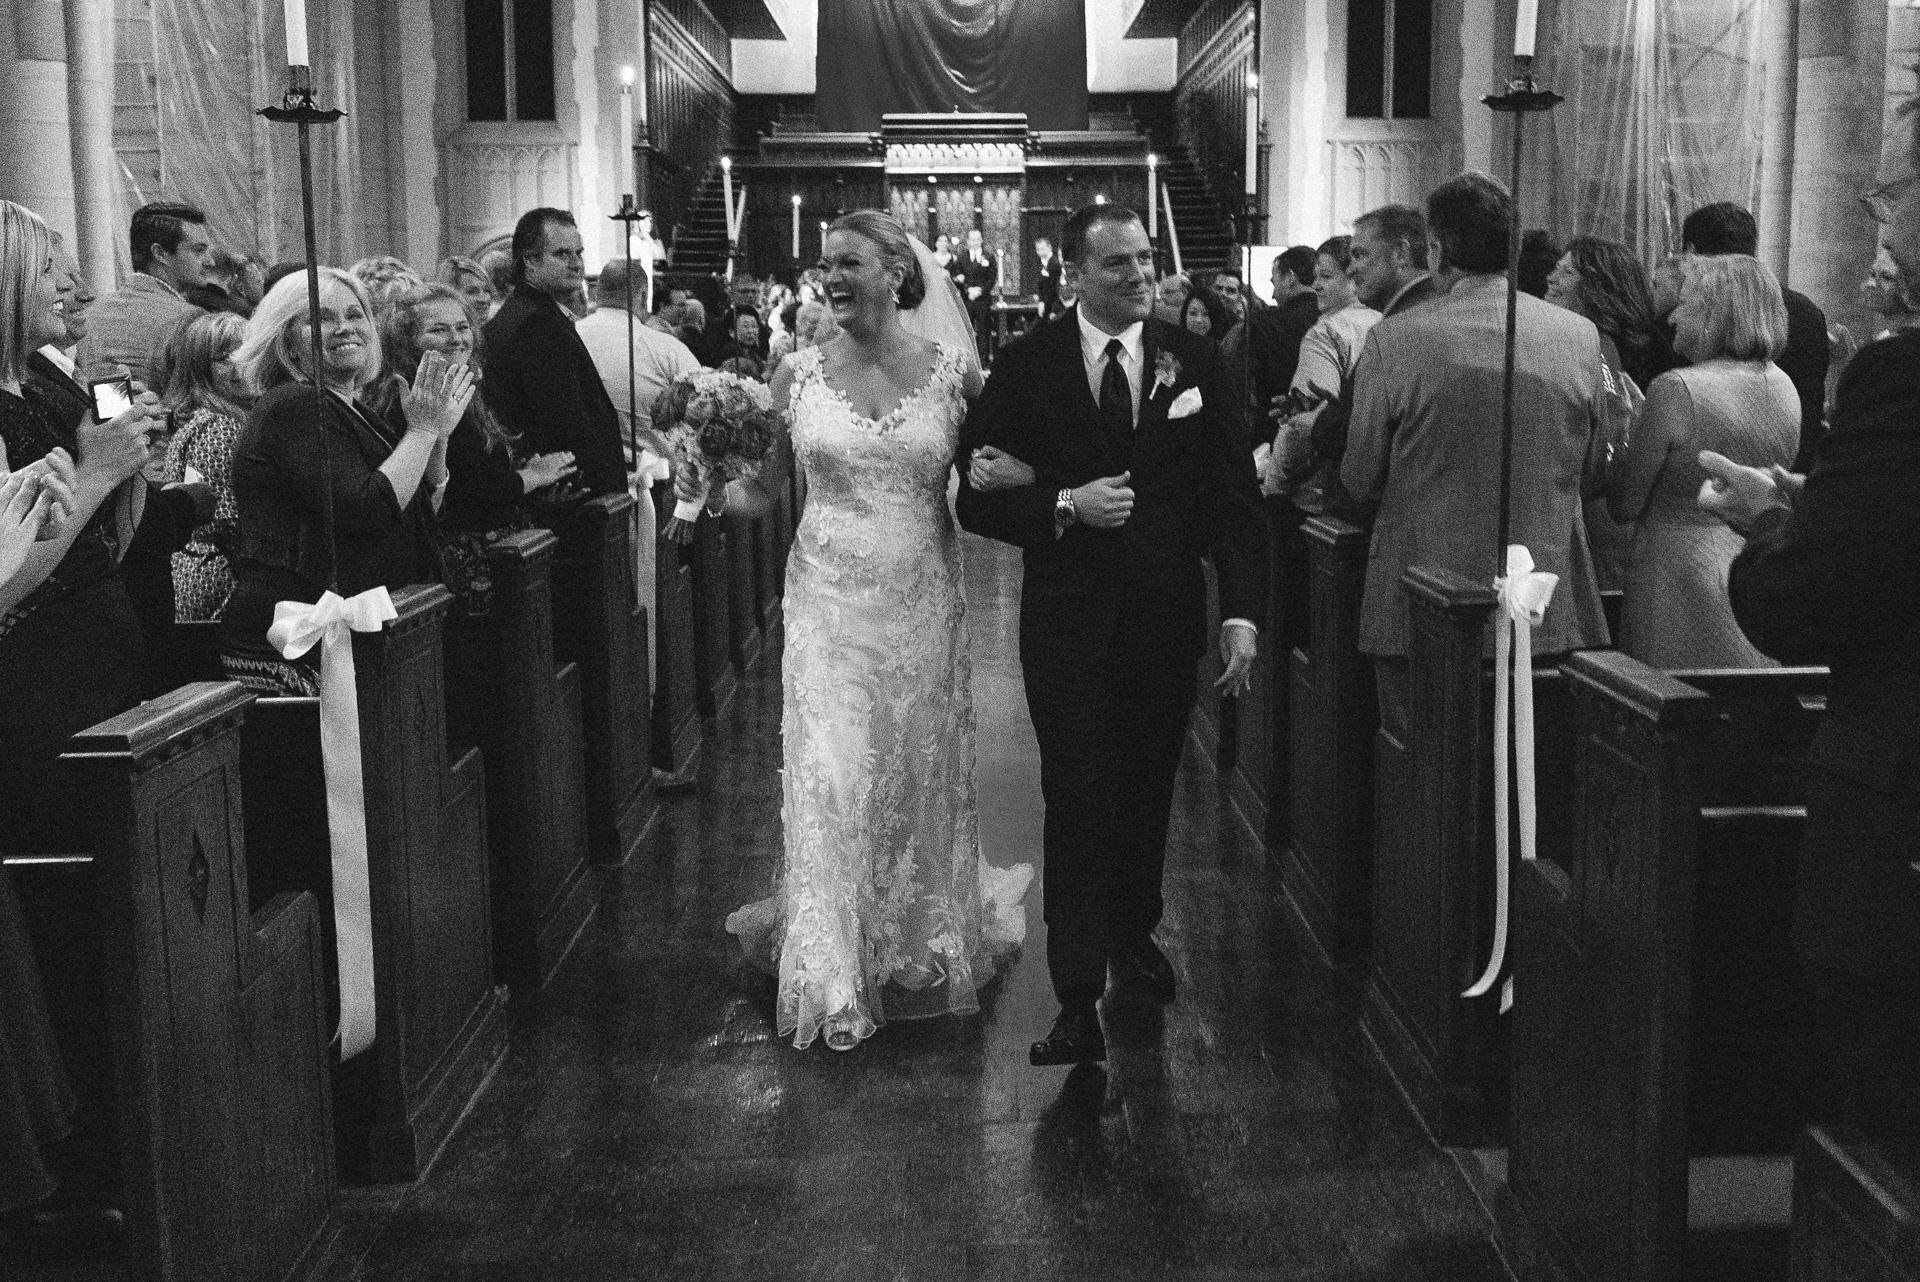 Dayton Wedding Photographer - Bride and Groom Isle